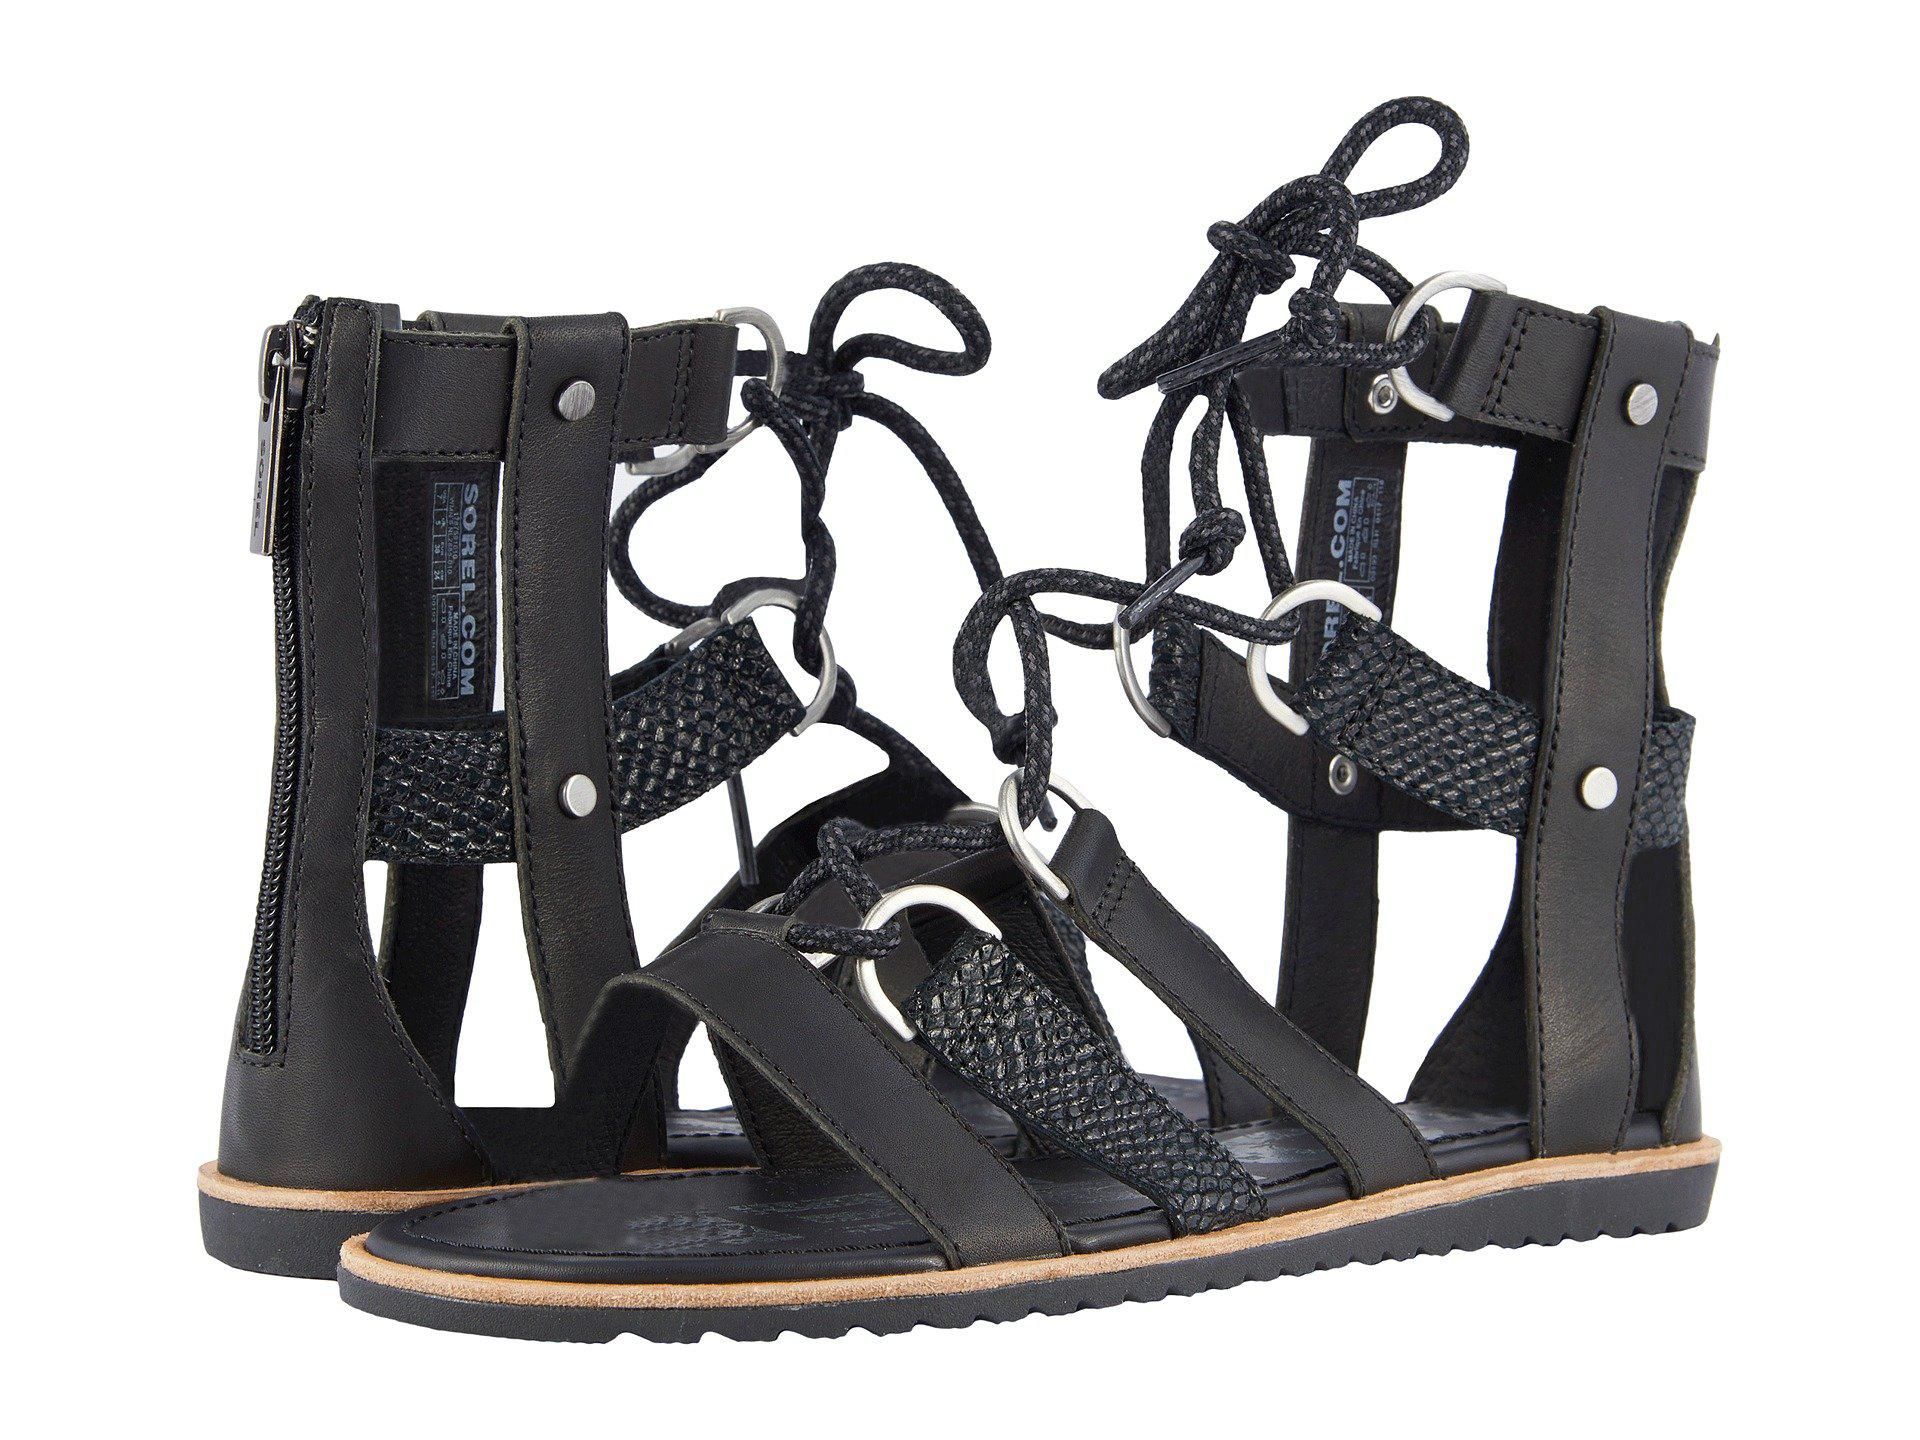 353e8b93366 Lyst - Sorel Ella Lace-up (black) Women s Lace Up Casual Shoes in Black